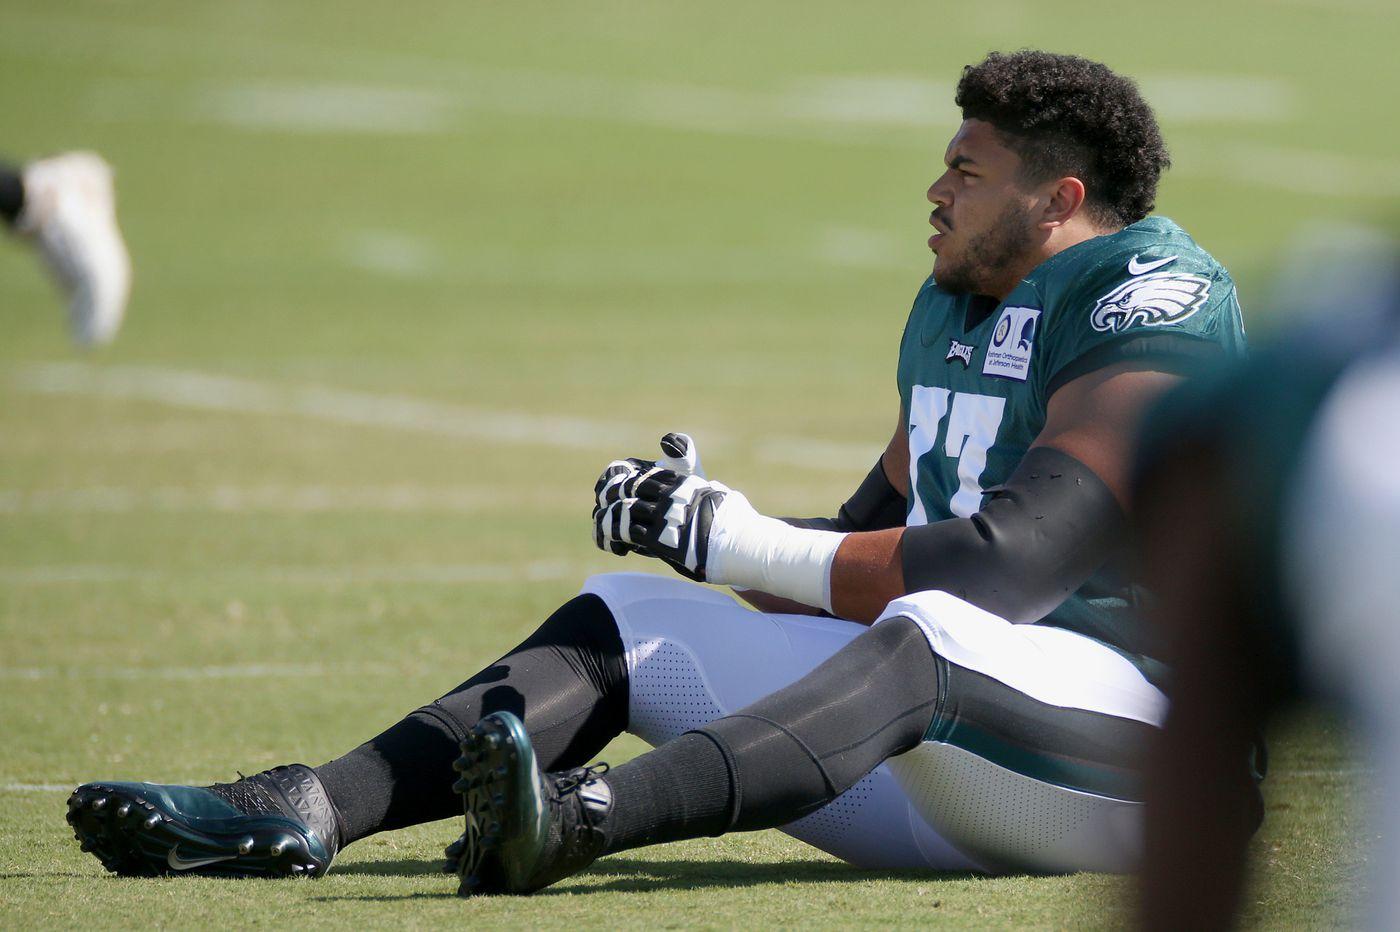 Eagles Practice Observations: Andre Dillard worry? Deep ball rising; DE decisions